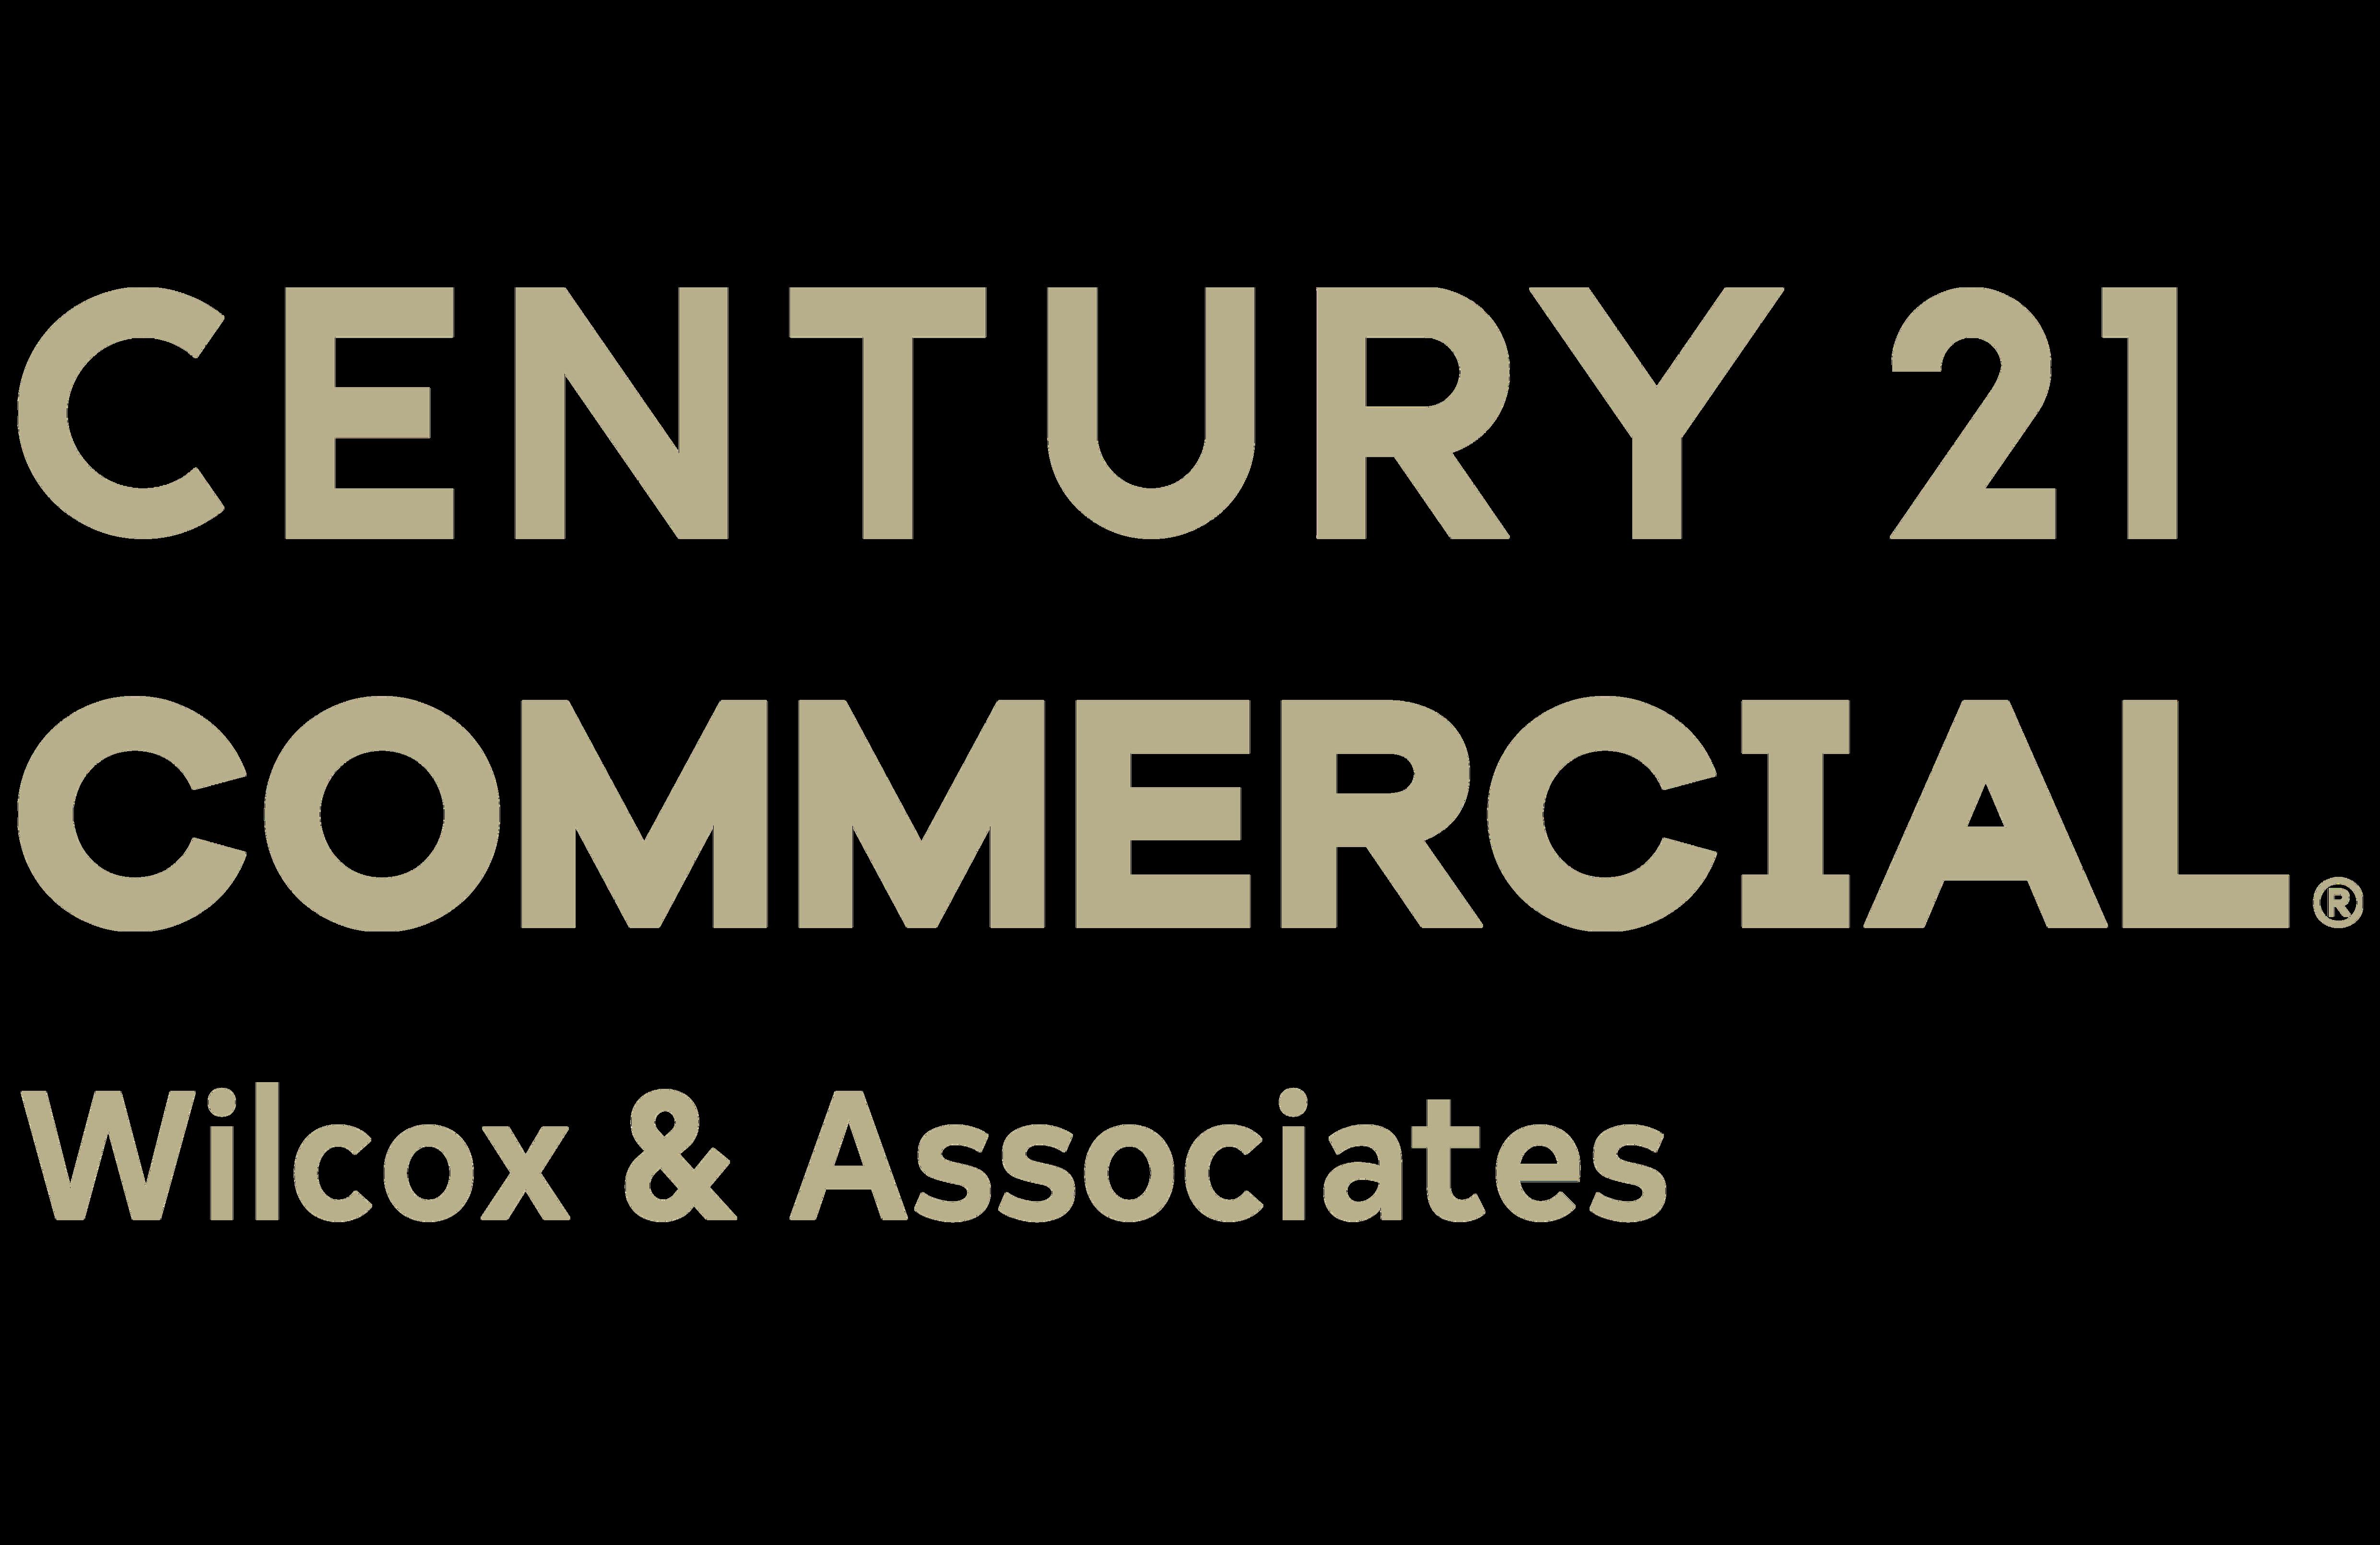 Annette Wilcox of CENTURY 21 Wilcox & Associates logo